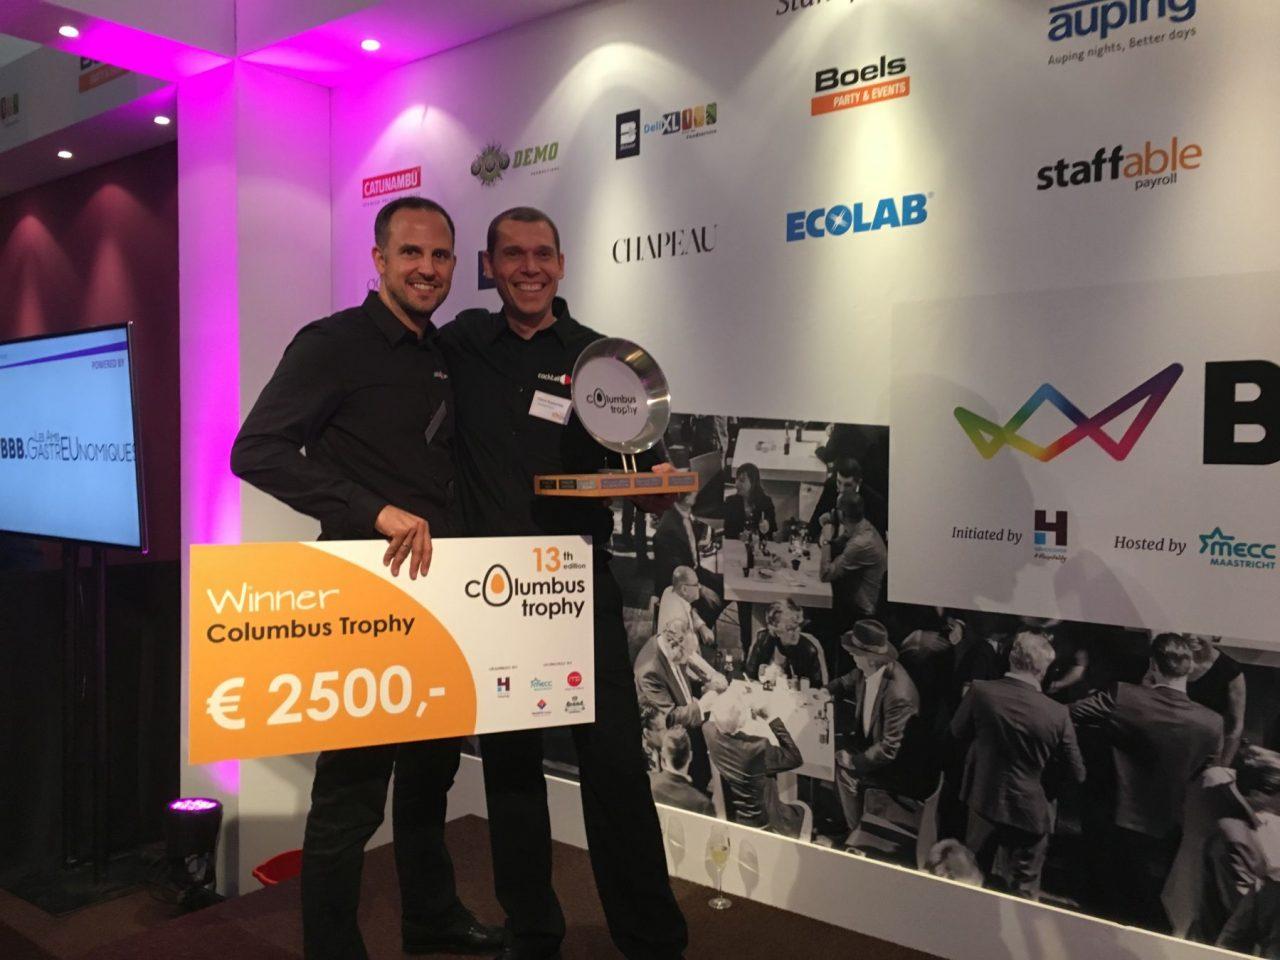 cocktail-box_Columbus_Trophy_2016_winner